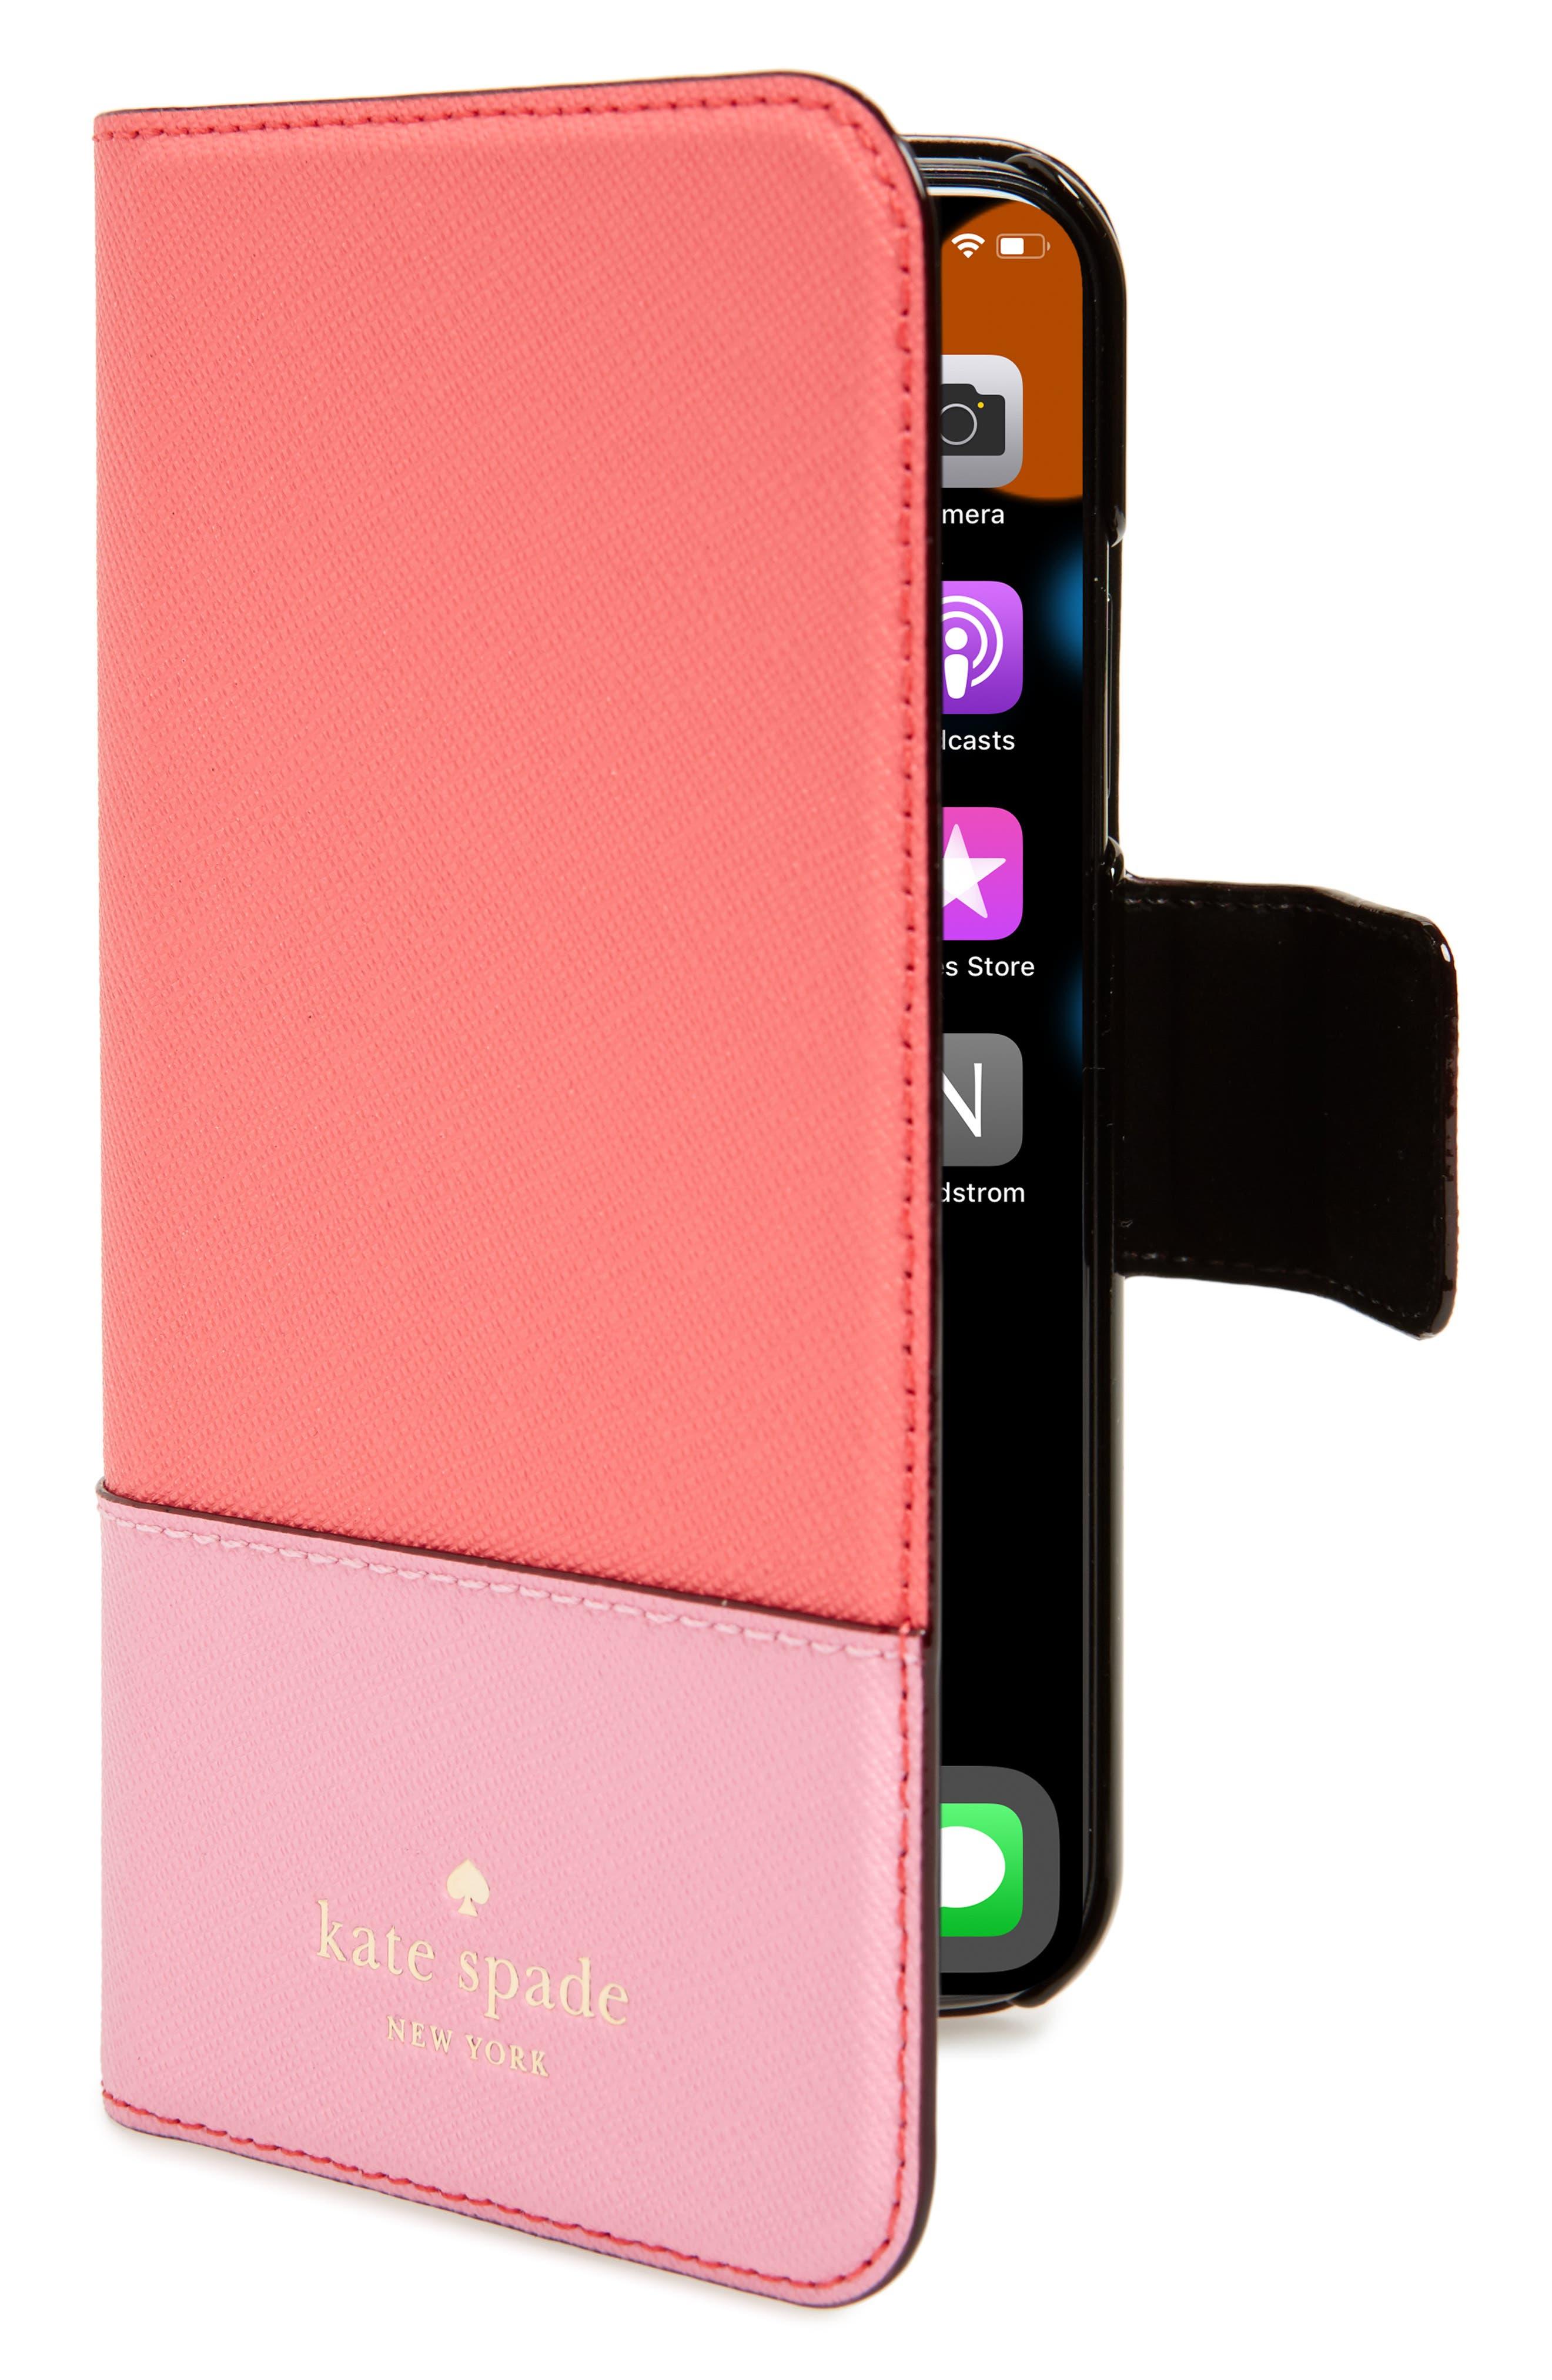 kate spade new york leather wrap iPhone X folio case